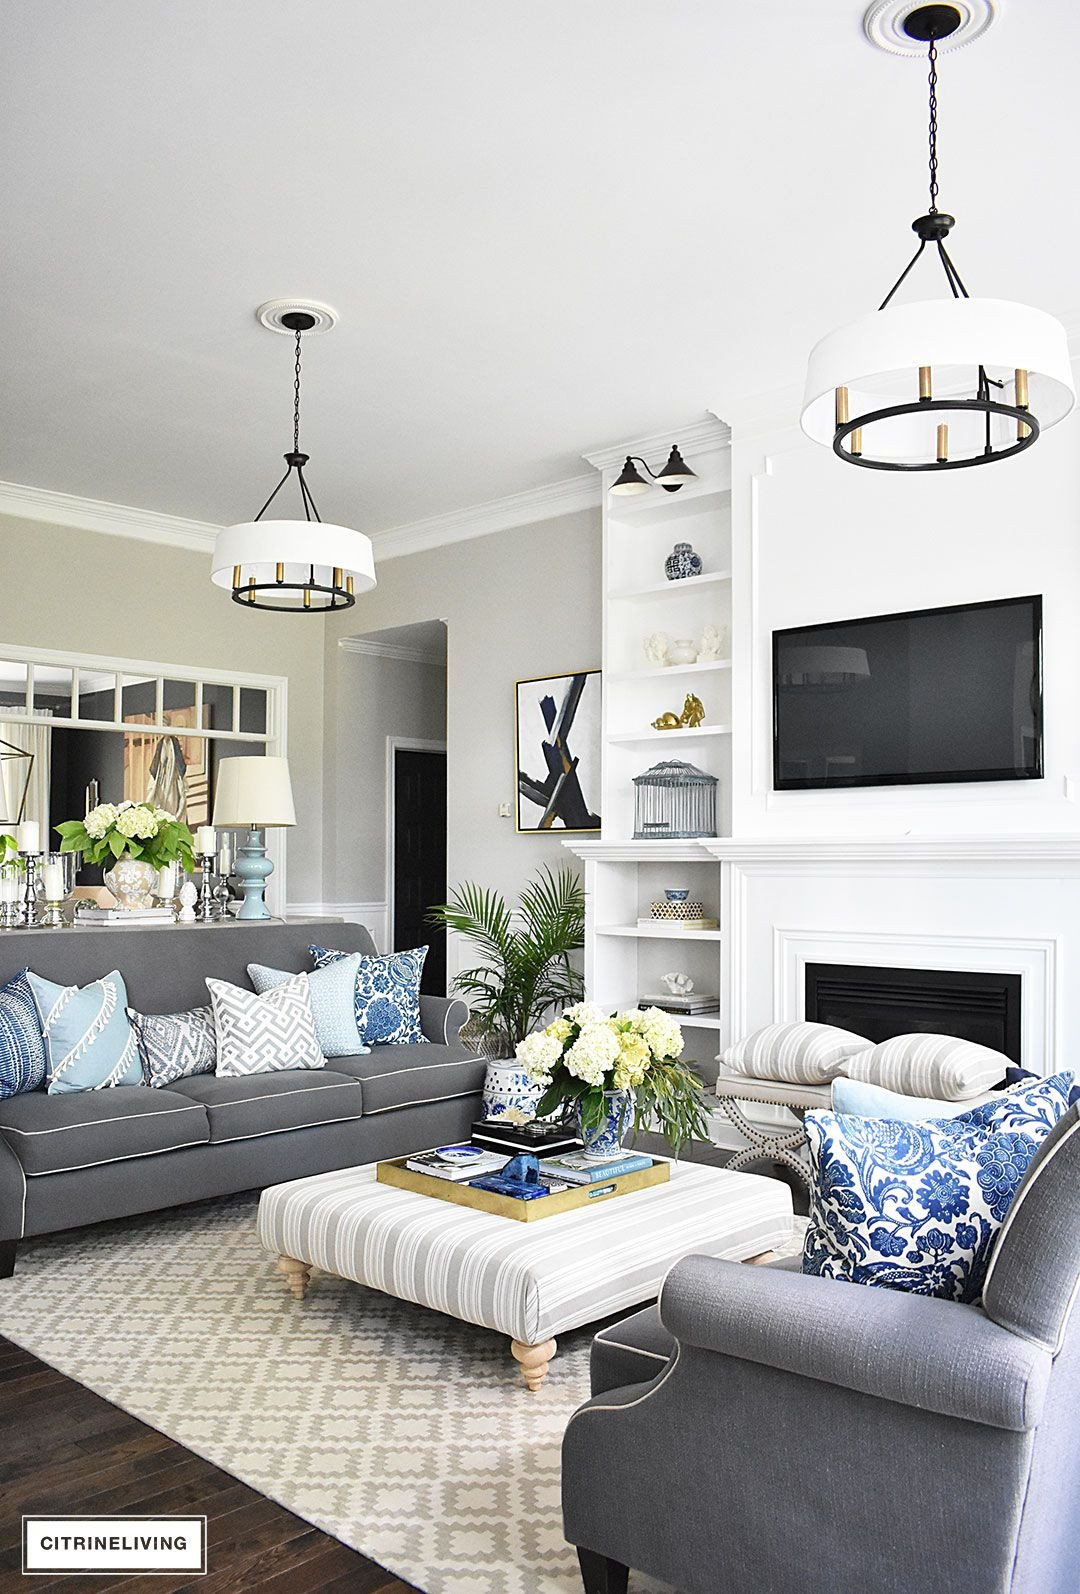 Blue and White Decor Ideas Luxury 20 Fresh Ideas for Decorating with Blue and White Blue and White